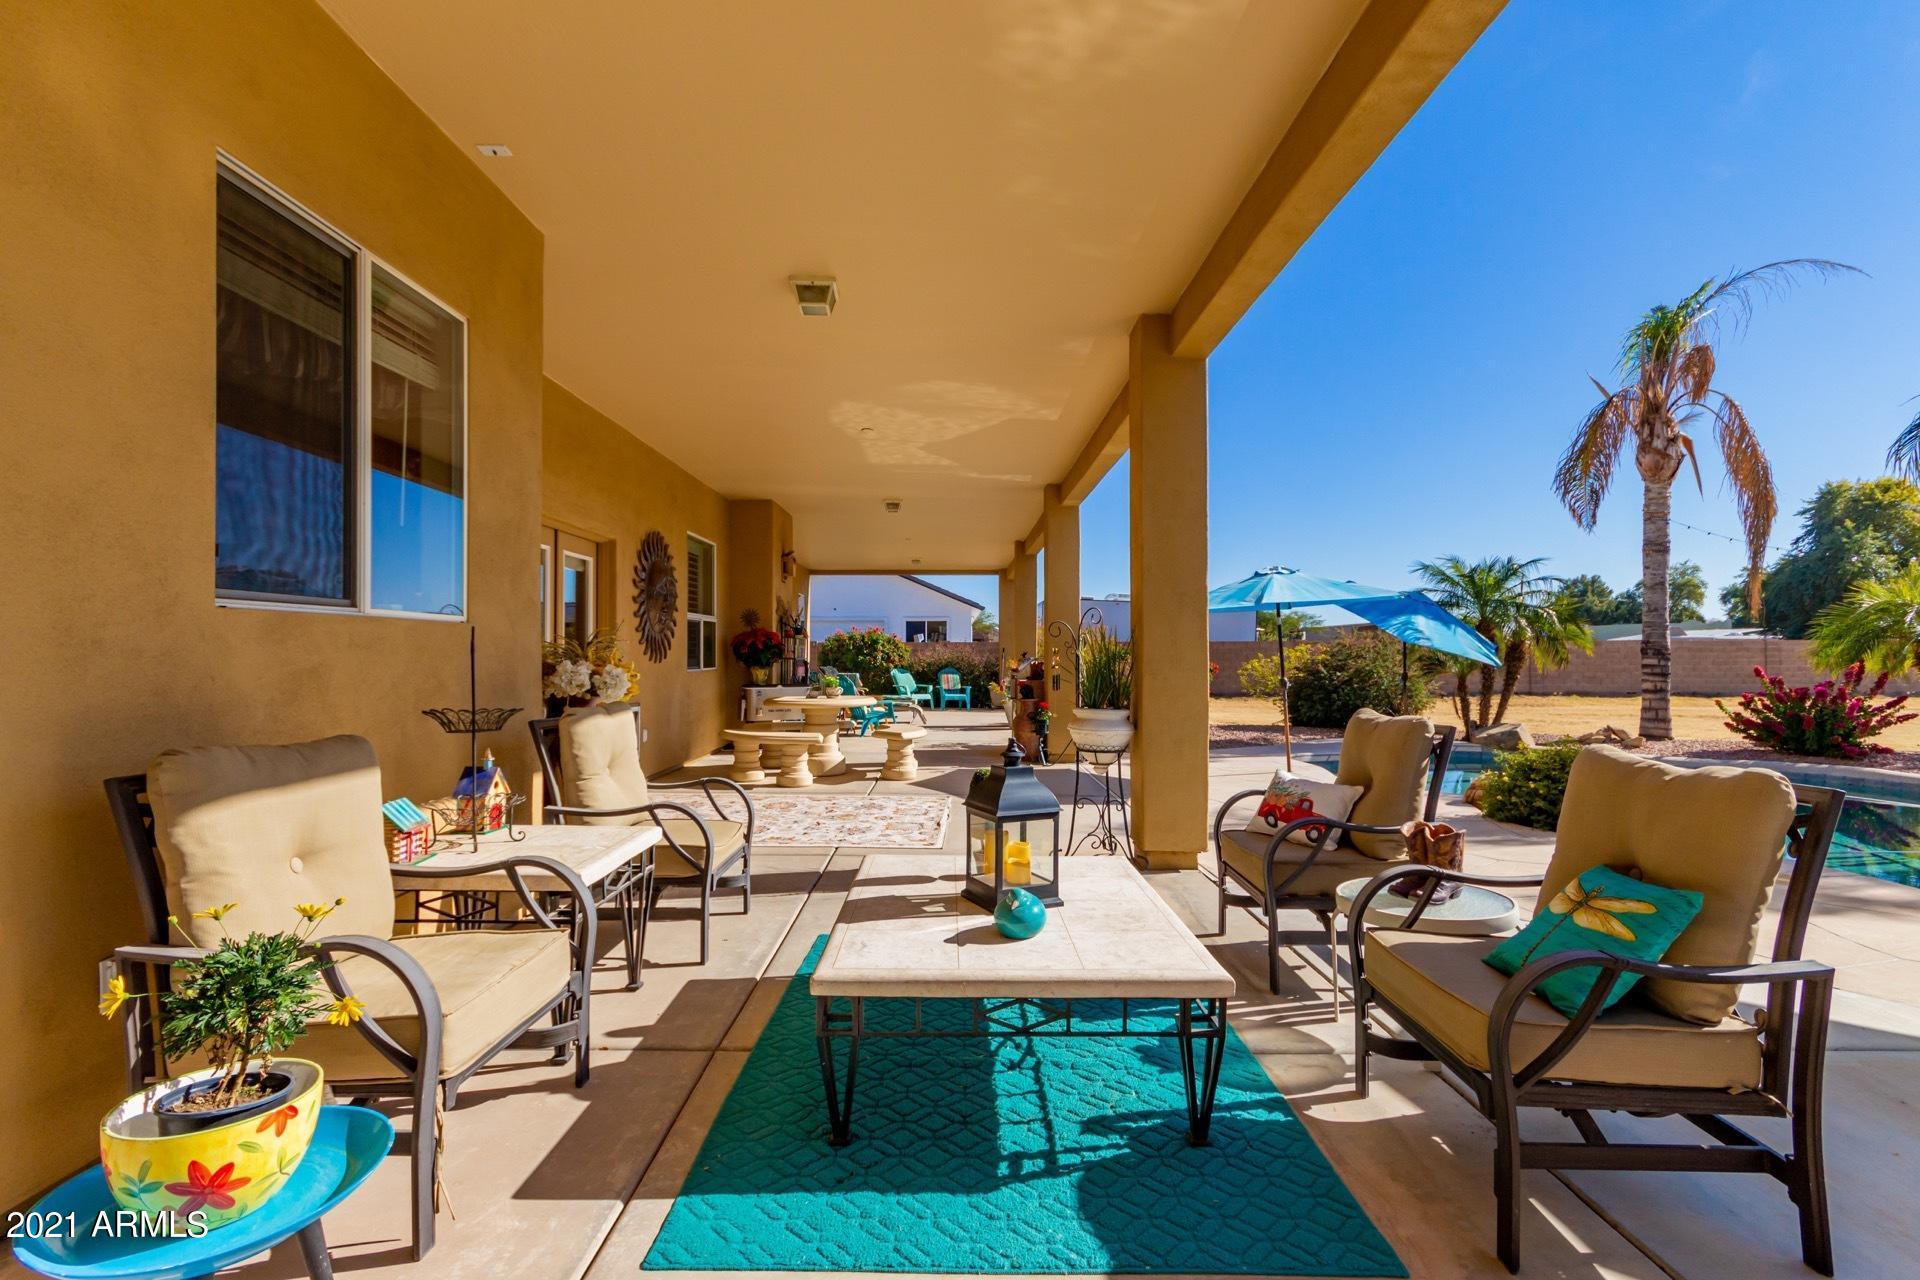 2627 MELROSE Street, Gilbert, Arizona 85297, 4 Bedrooms Bedrooms, ,2.5 BathroomsBathrooms,Residential,For Sale,MELROSE,6230806